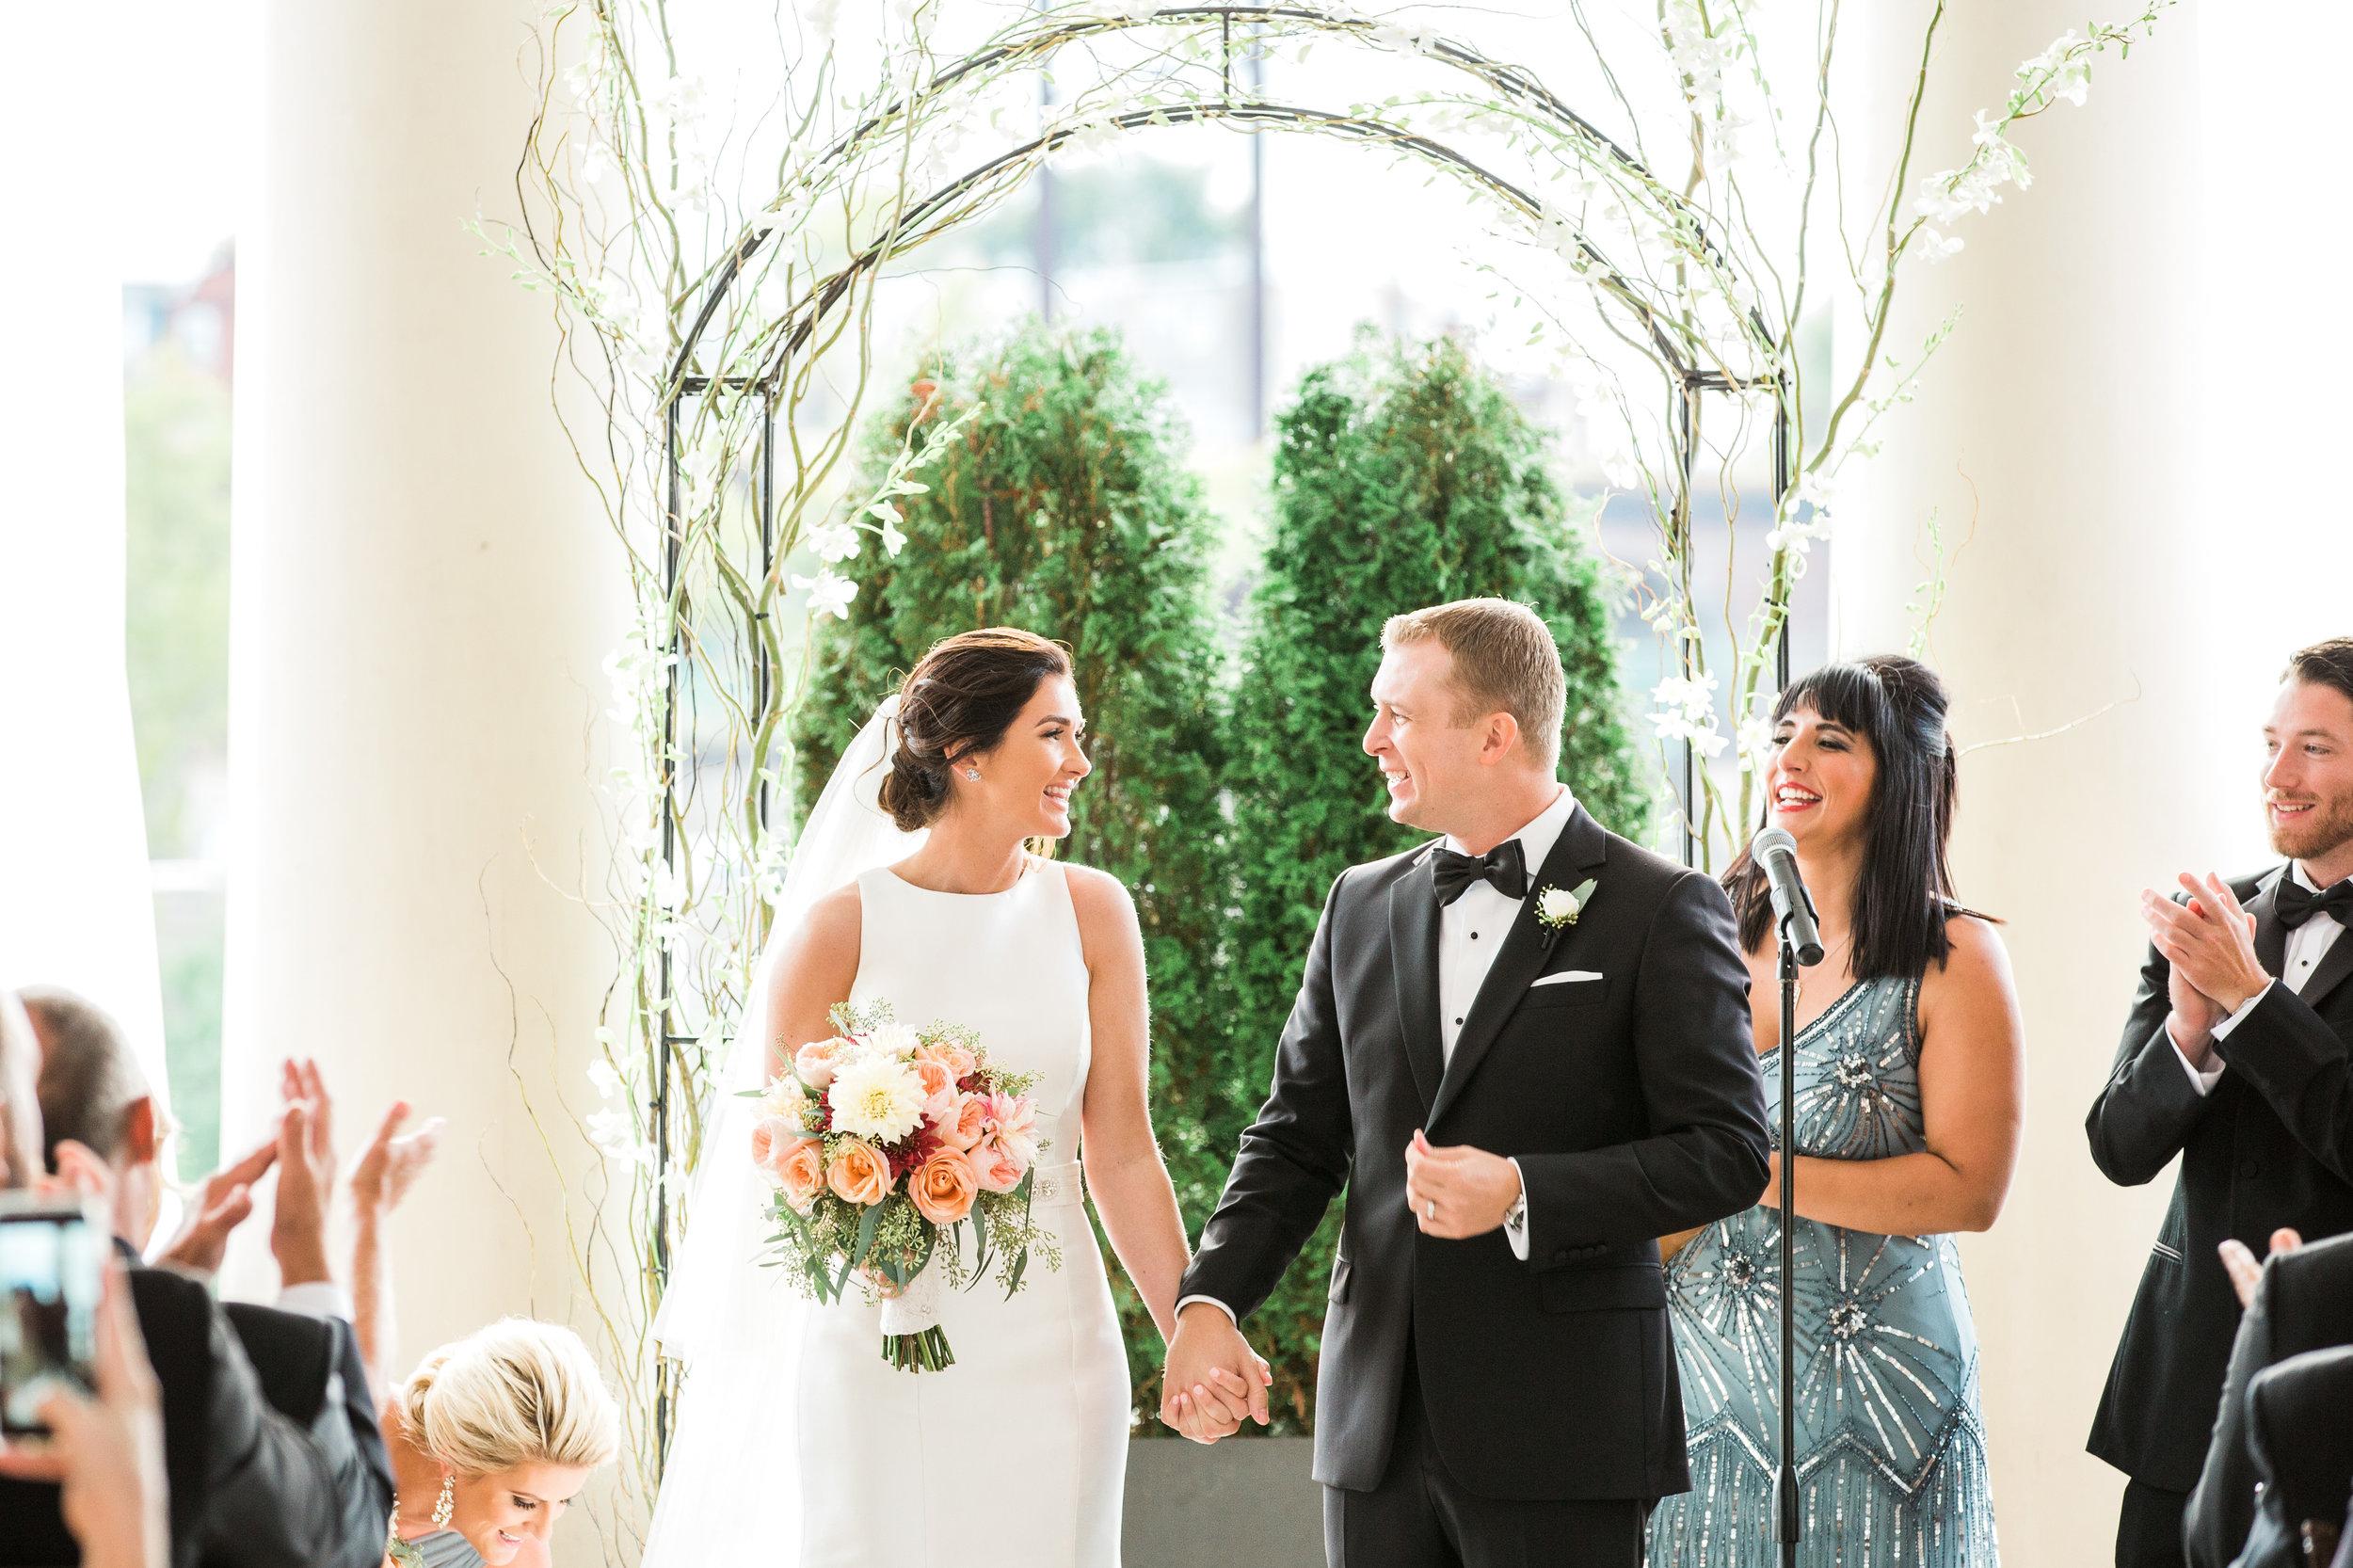 Hudson-Nichols-Black-Tie-Bride-Philadelphia-Waterworks-Wedding-Cescaphe-Ceremony26.jpg